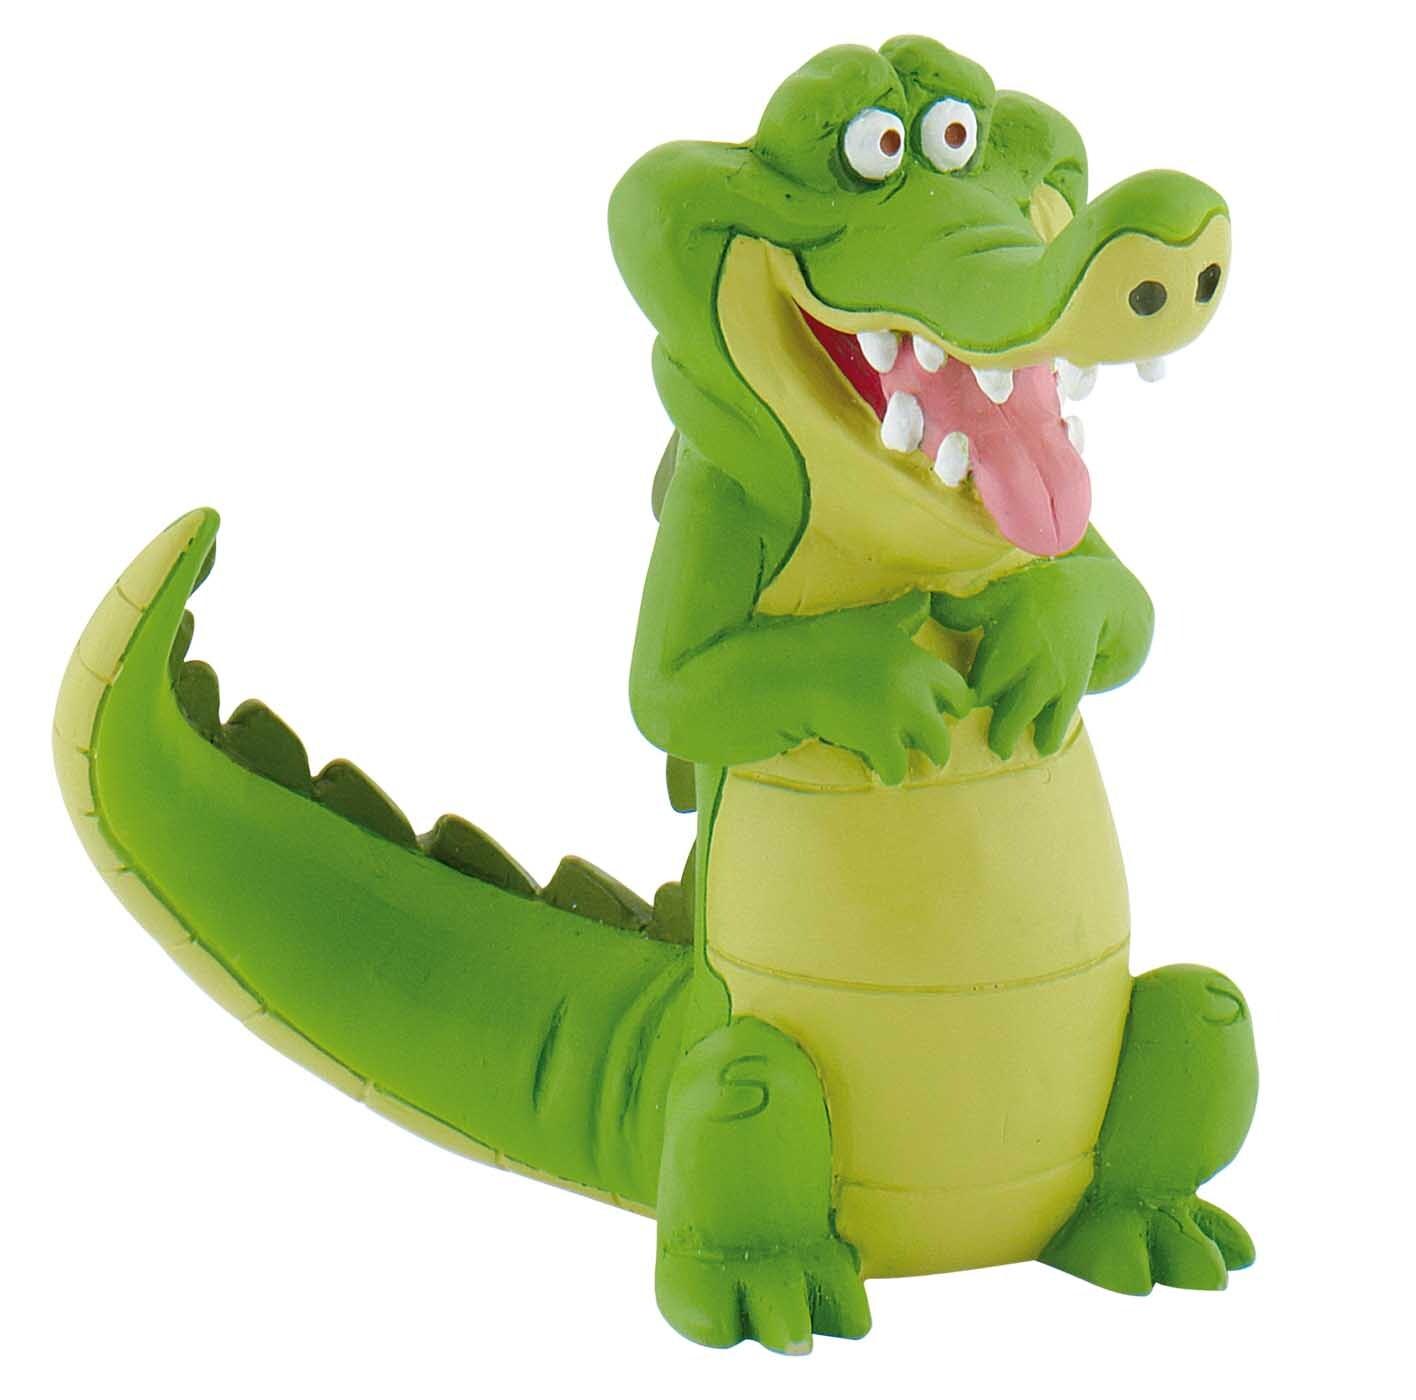 Figurine Jake et les pirates Disney - Crocodile Tic Tac - 7 cm